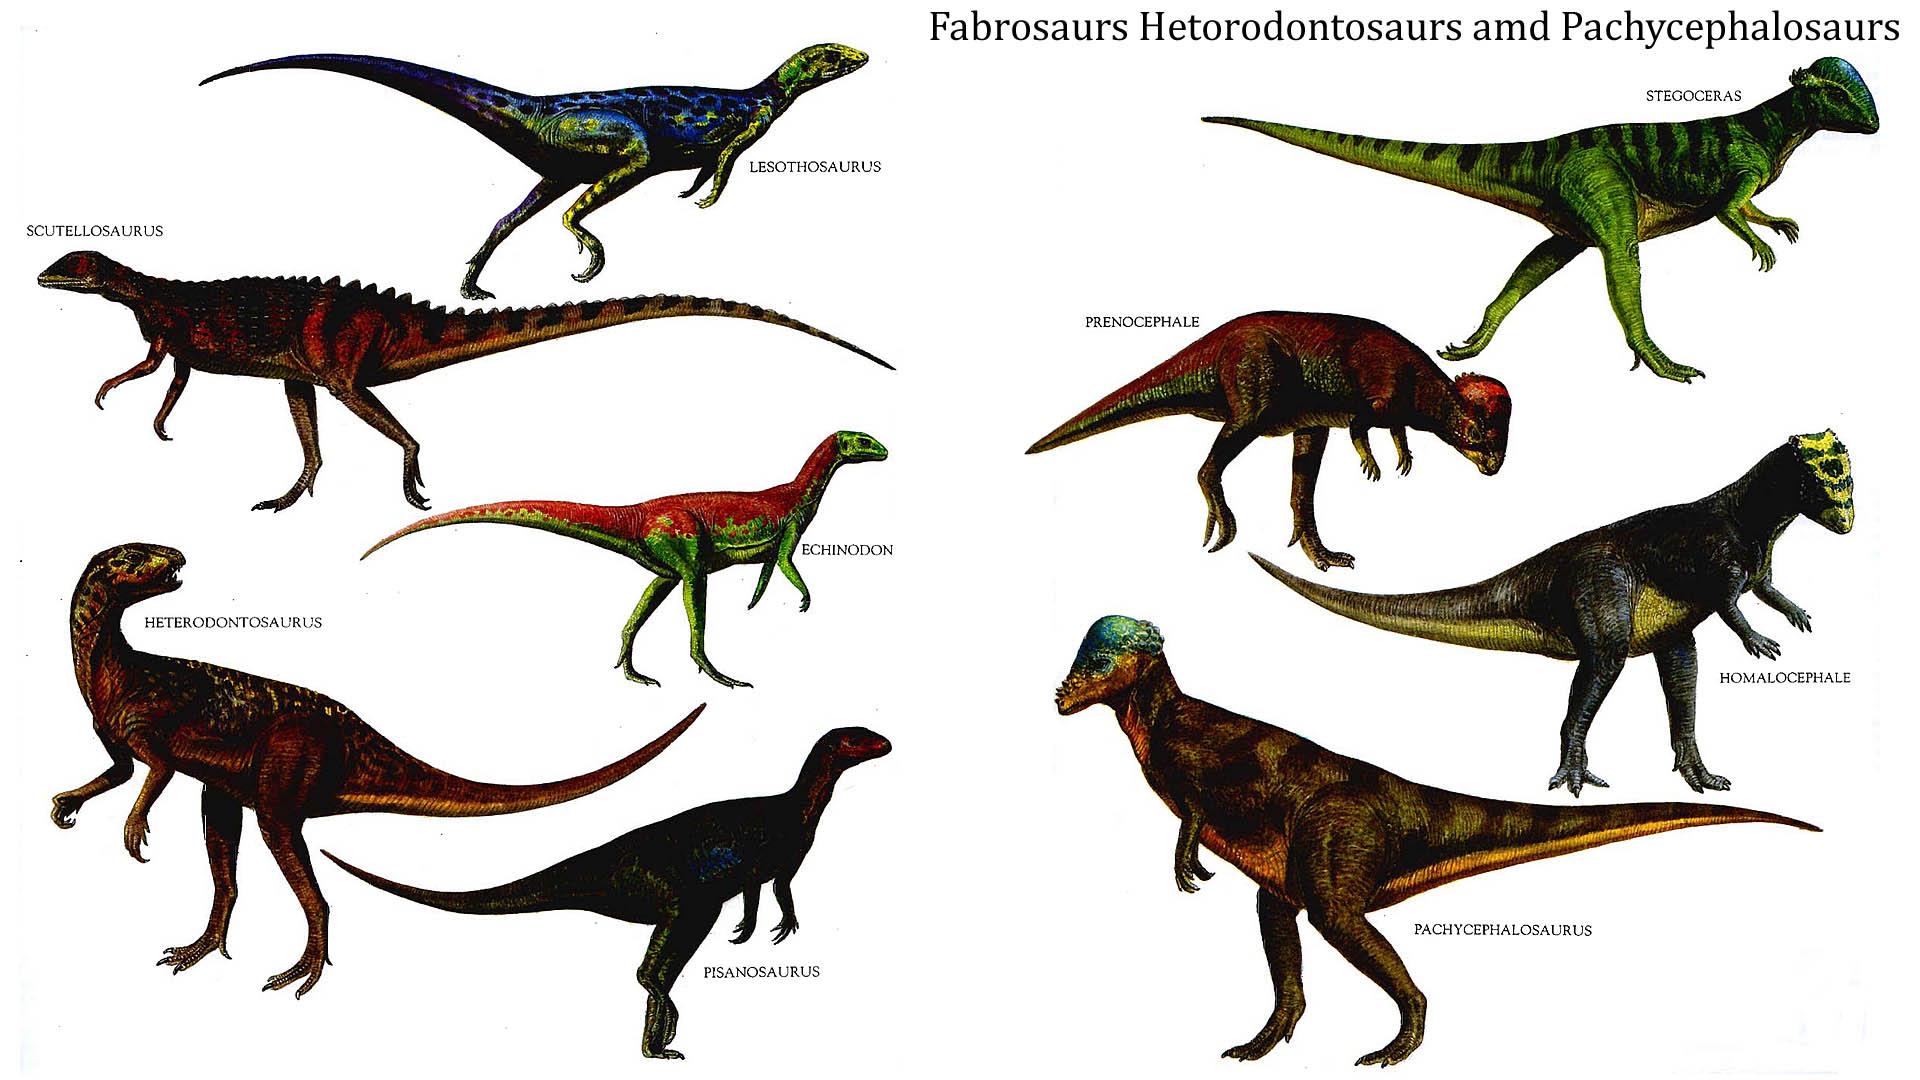 Fabrosaurs Hetorodontosaurs And Pachycephalosaurs